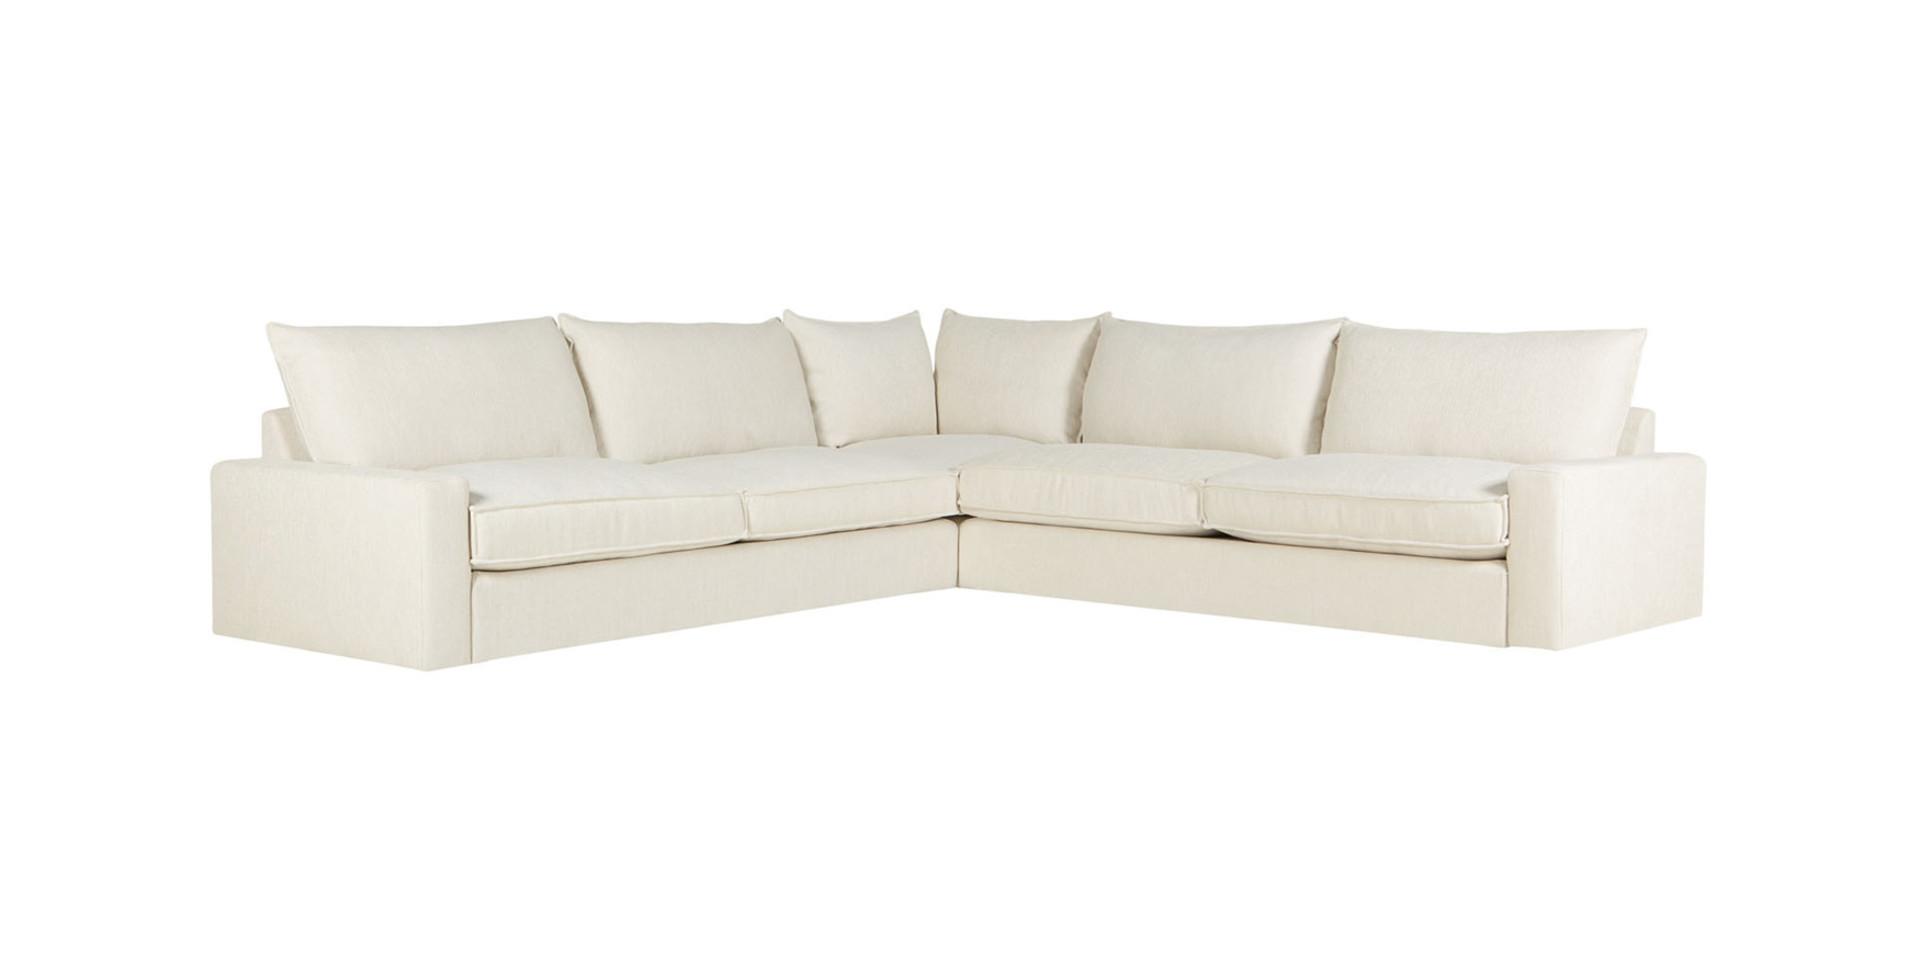 sits-oscar-angle-set3_roma2_natur_2